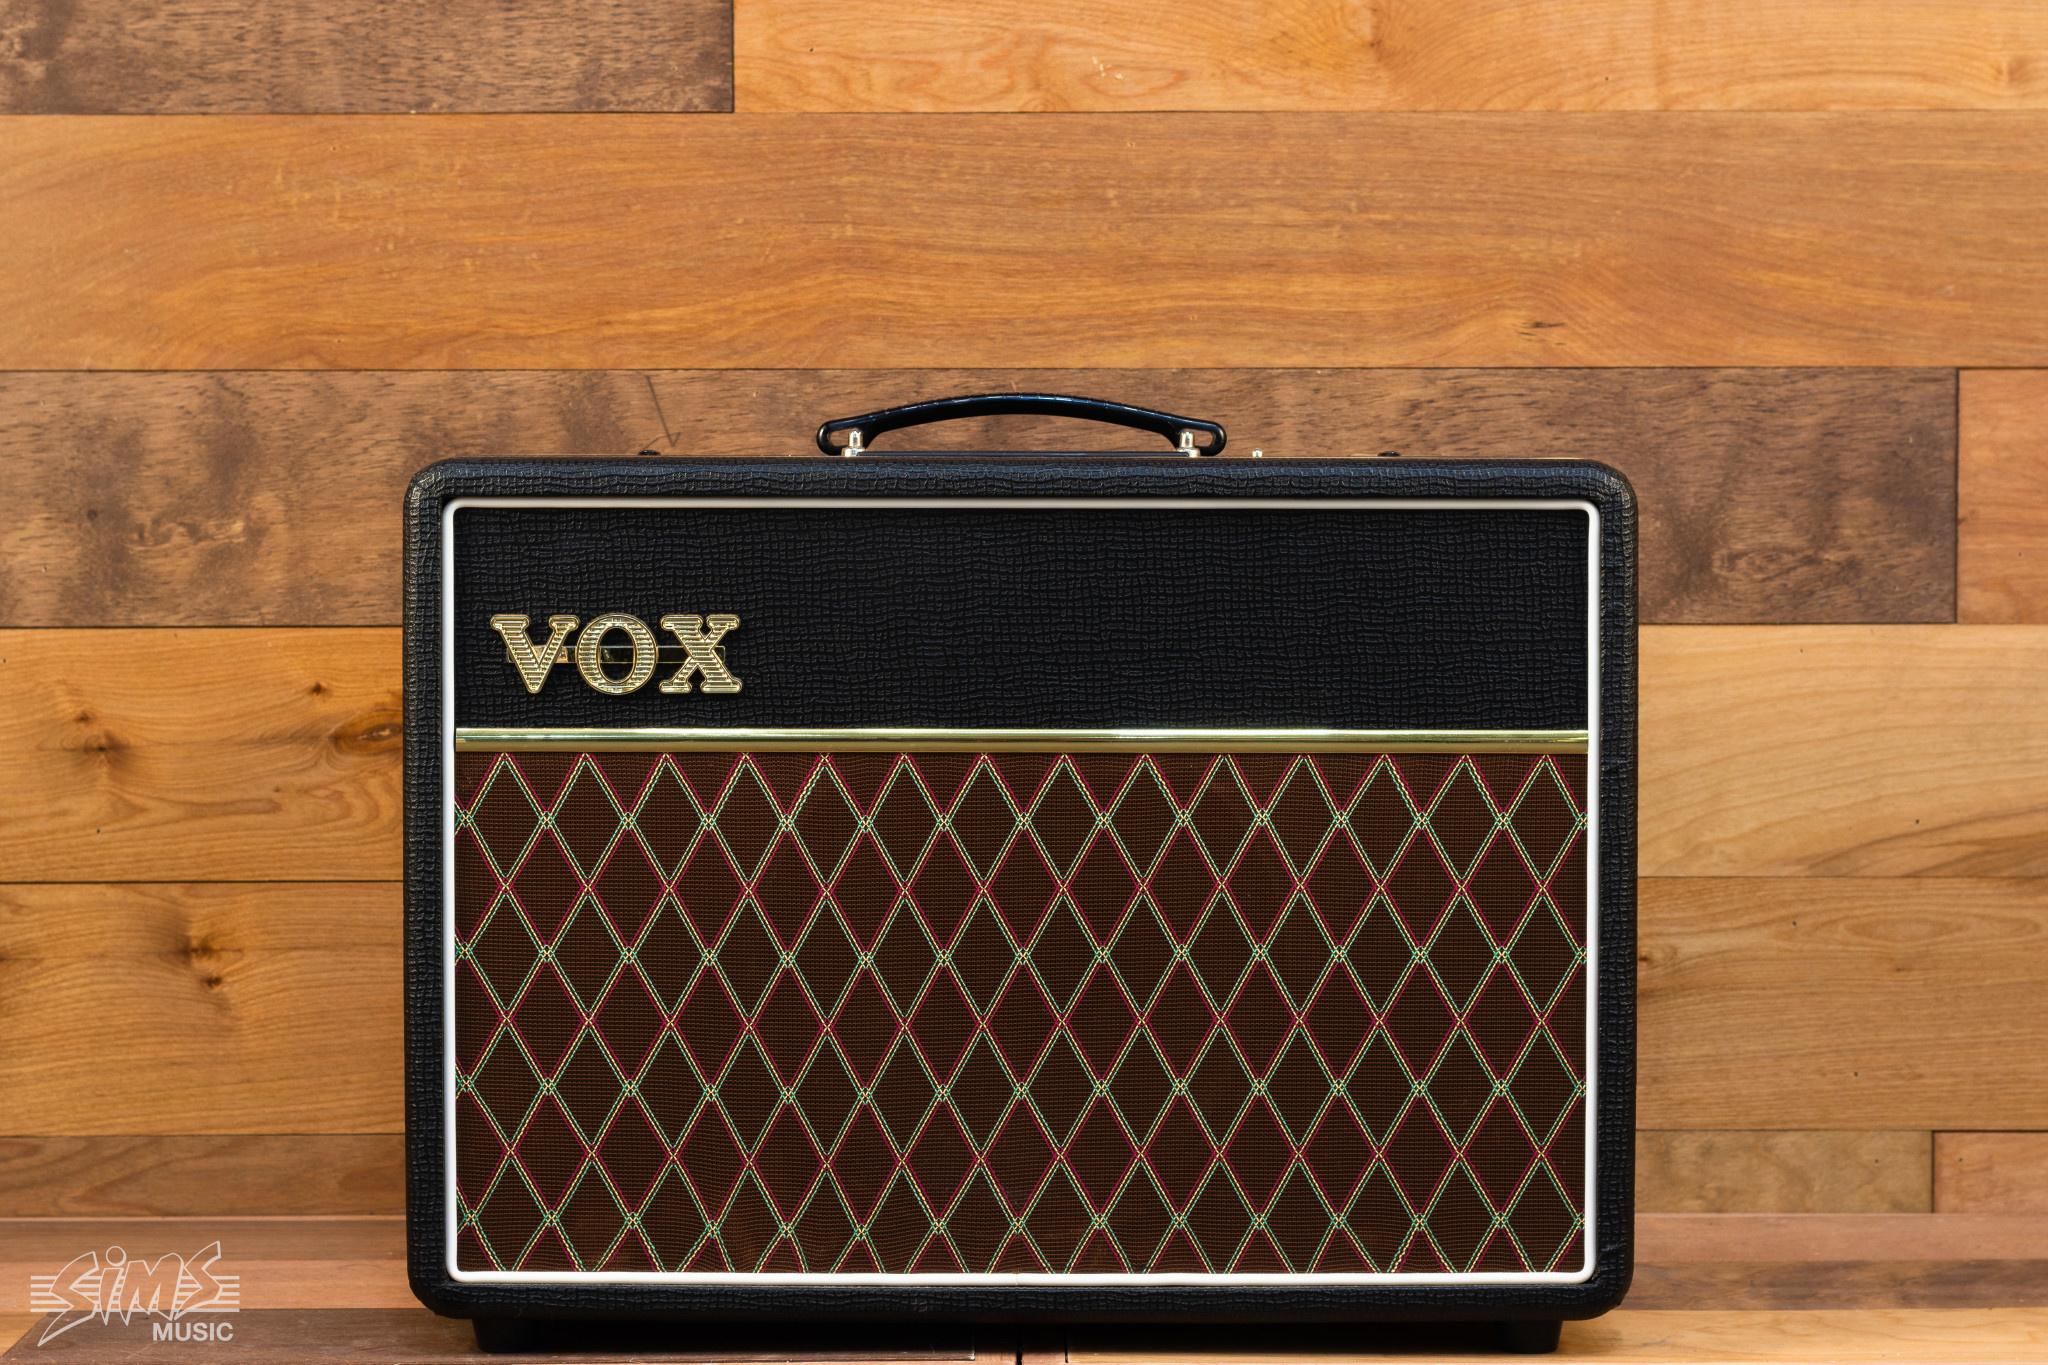 VOX VOX AC10C1 Guitar Amplifier